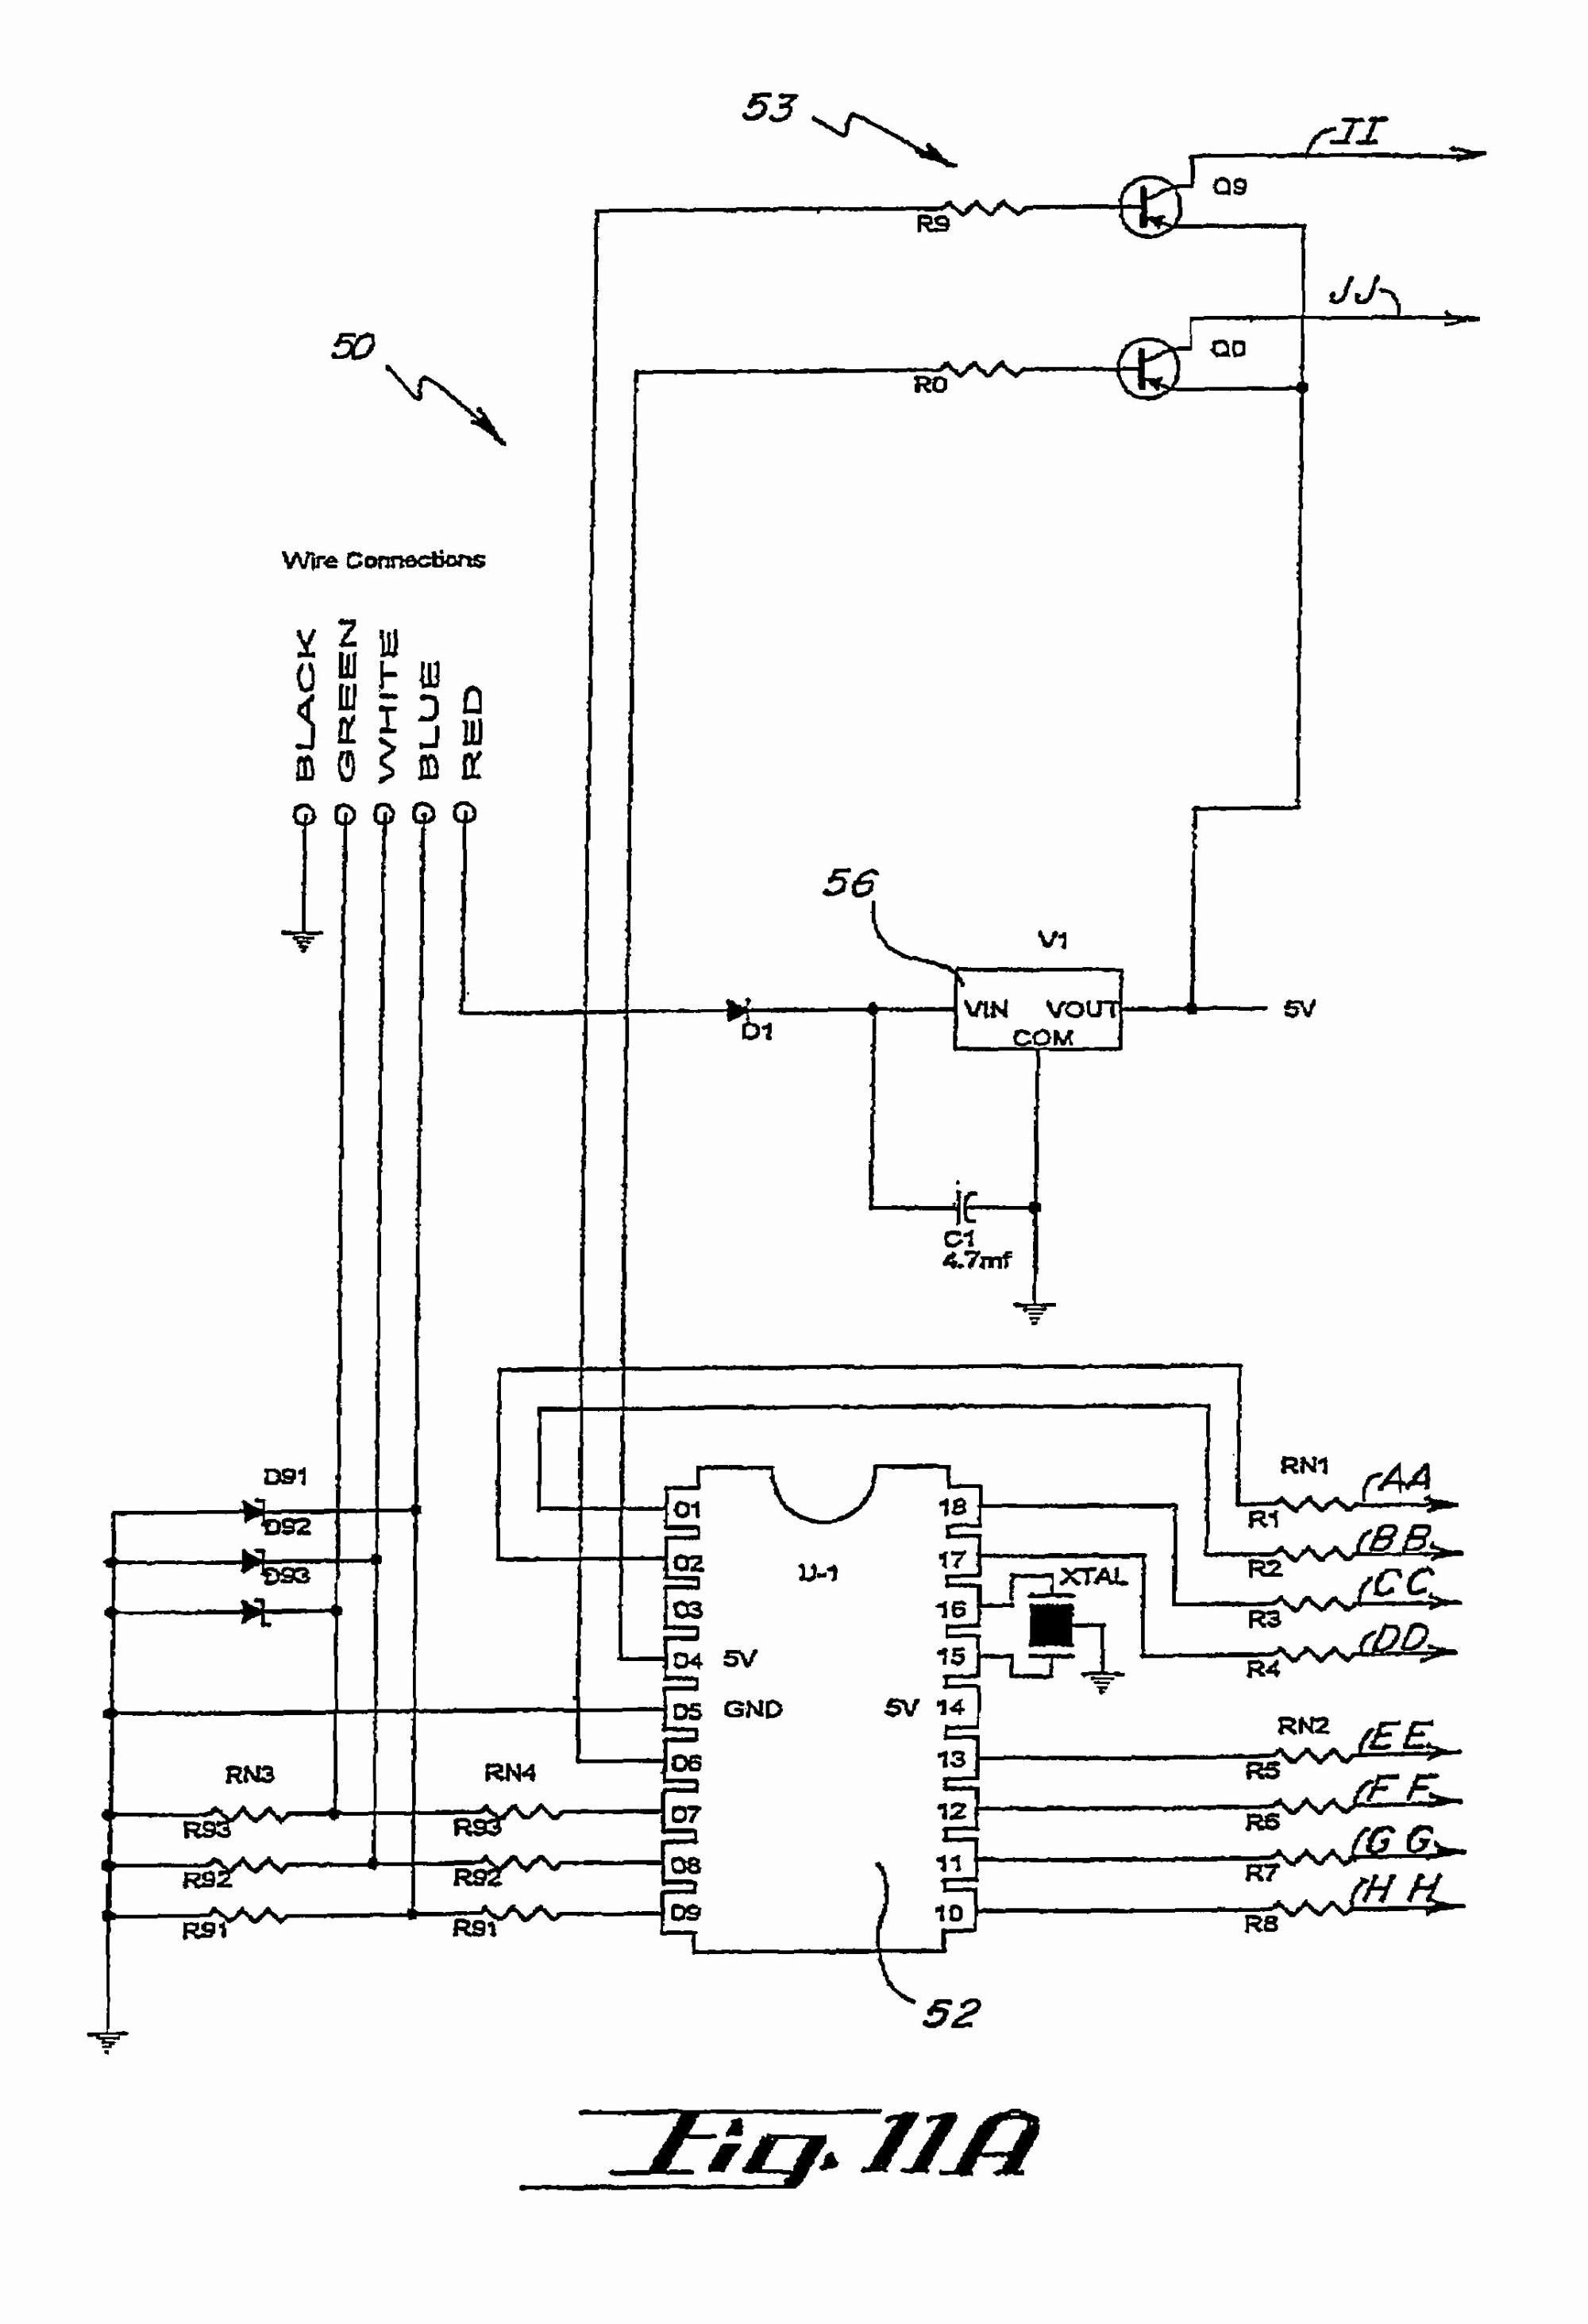 hight resolution of whelen led wiring diagram wiring diagramwiring diagram whelen ulf44 wiring diagram loadwiring diagram whelen ulf44 wiring